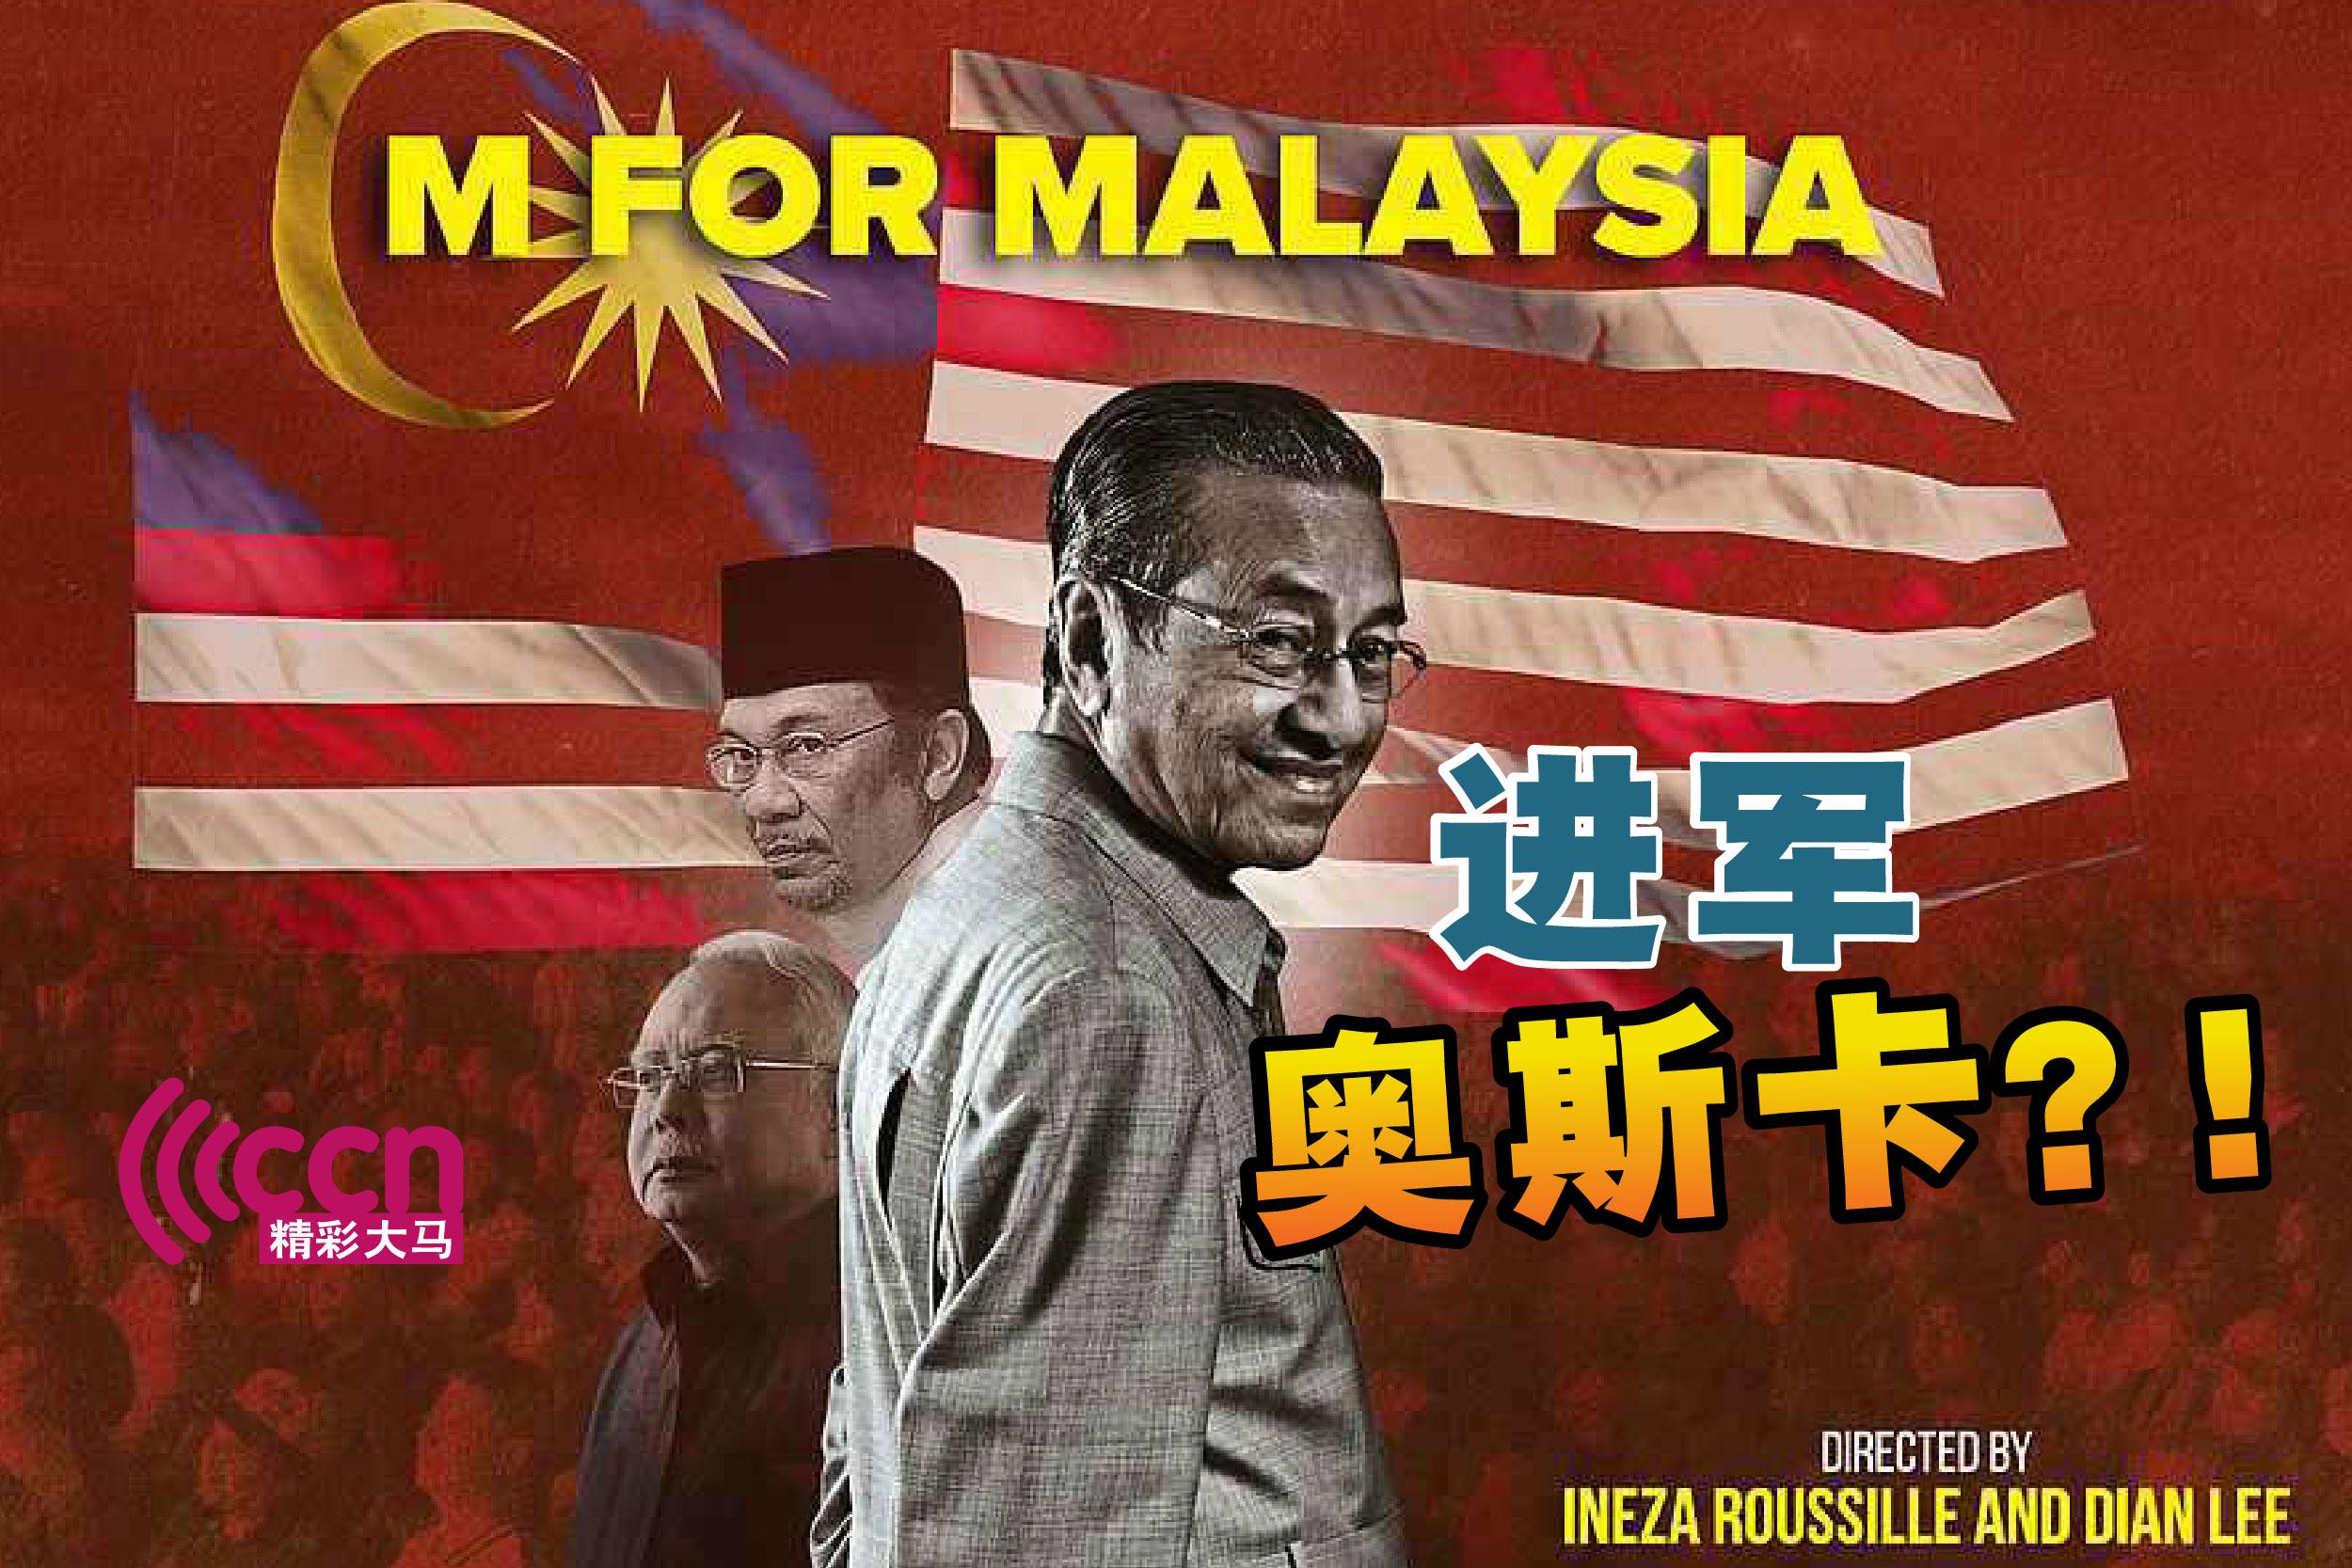 《M For Malaysia》将代表大马申请角逐奥斯卡奖国际电影类别,一共有不同区域的93部电影做出申请。-精彩大马制图-